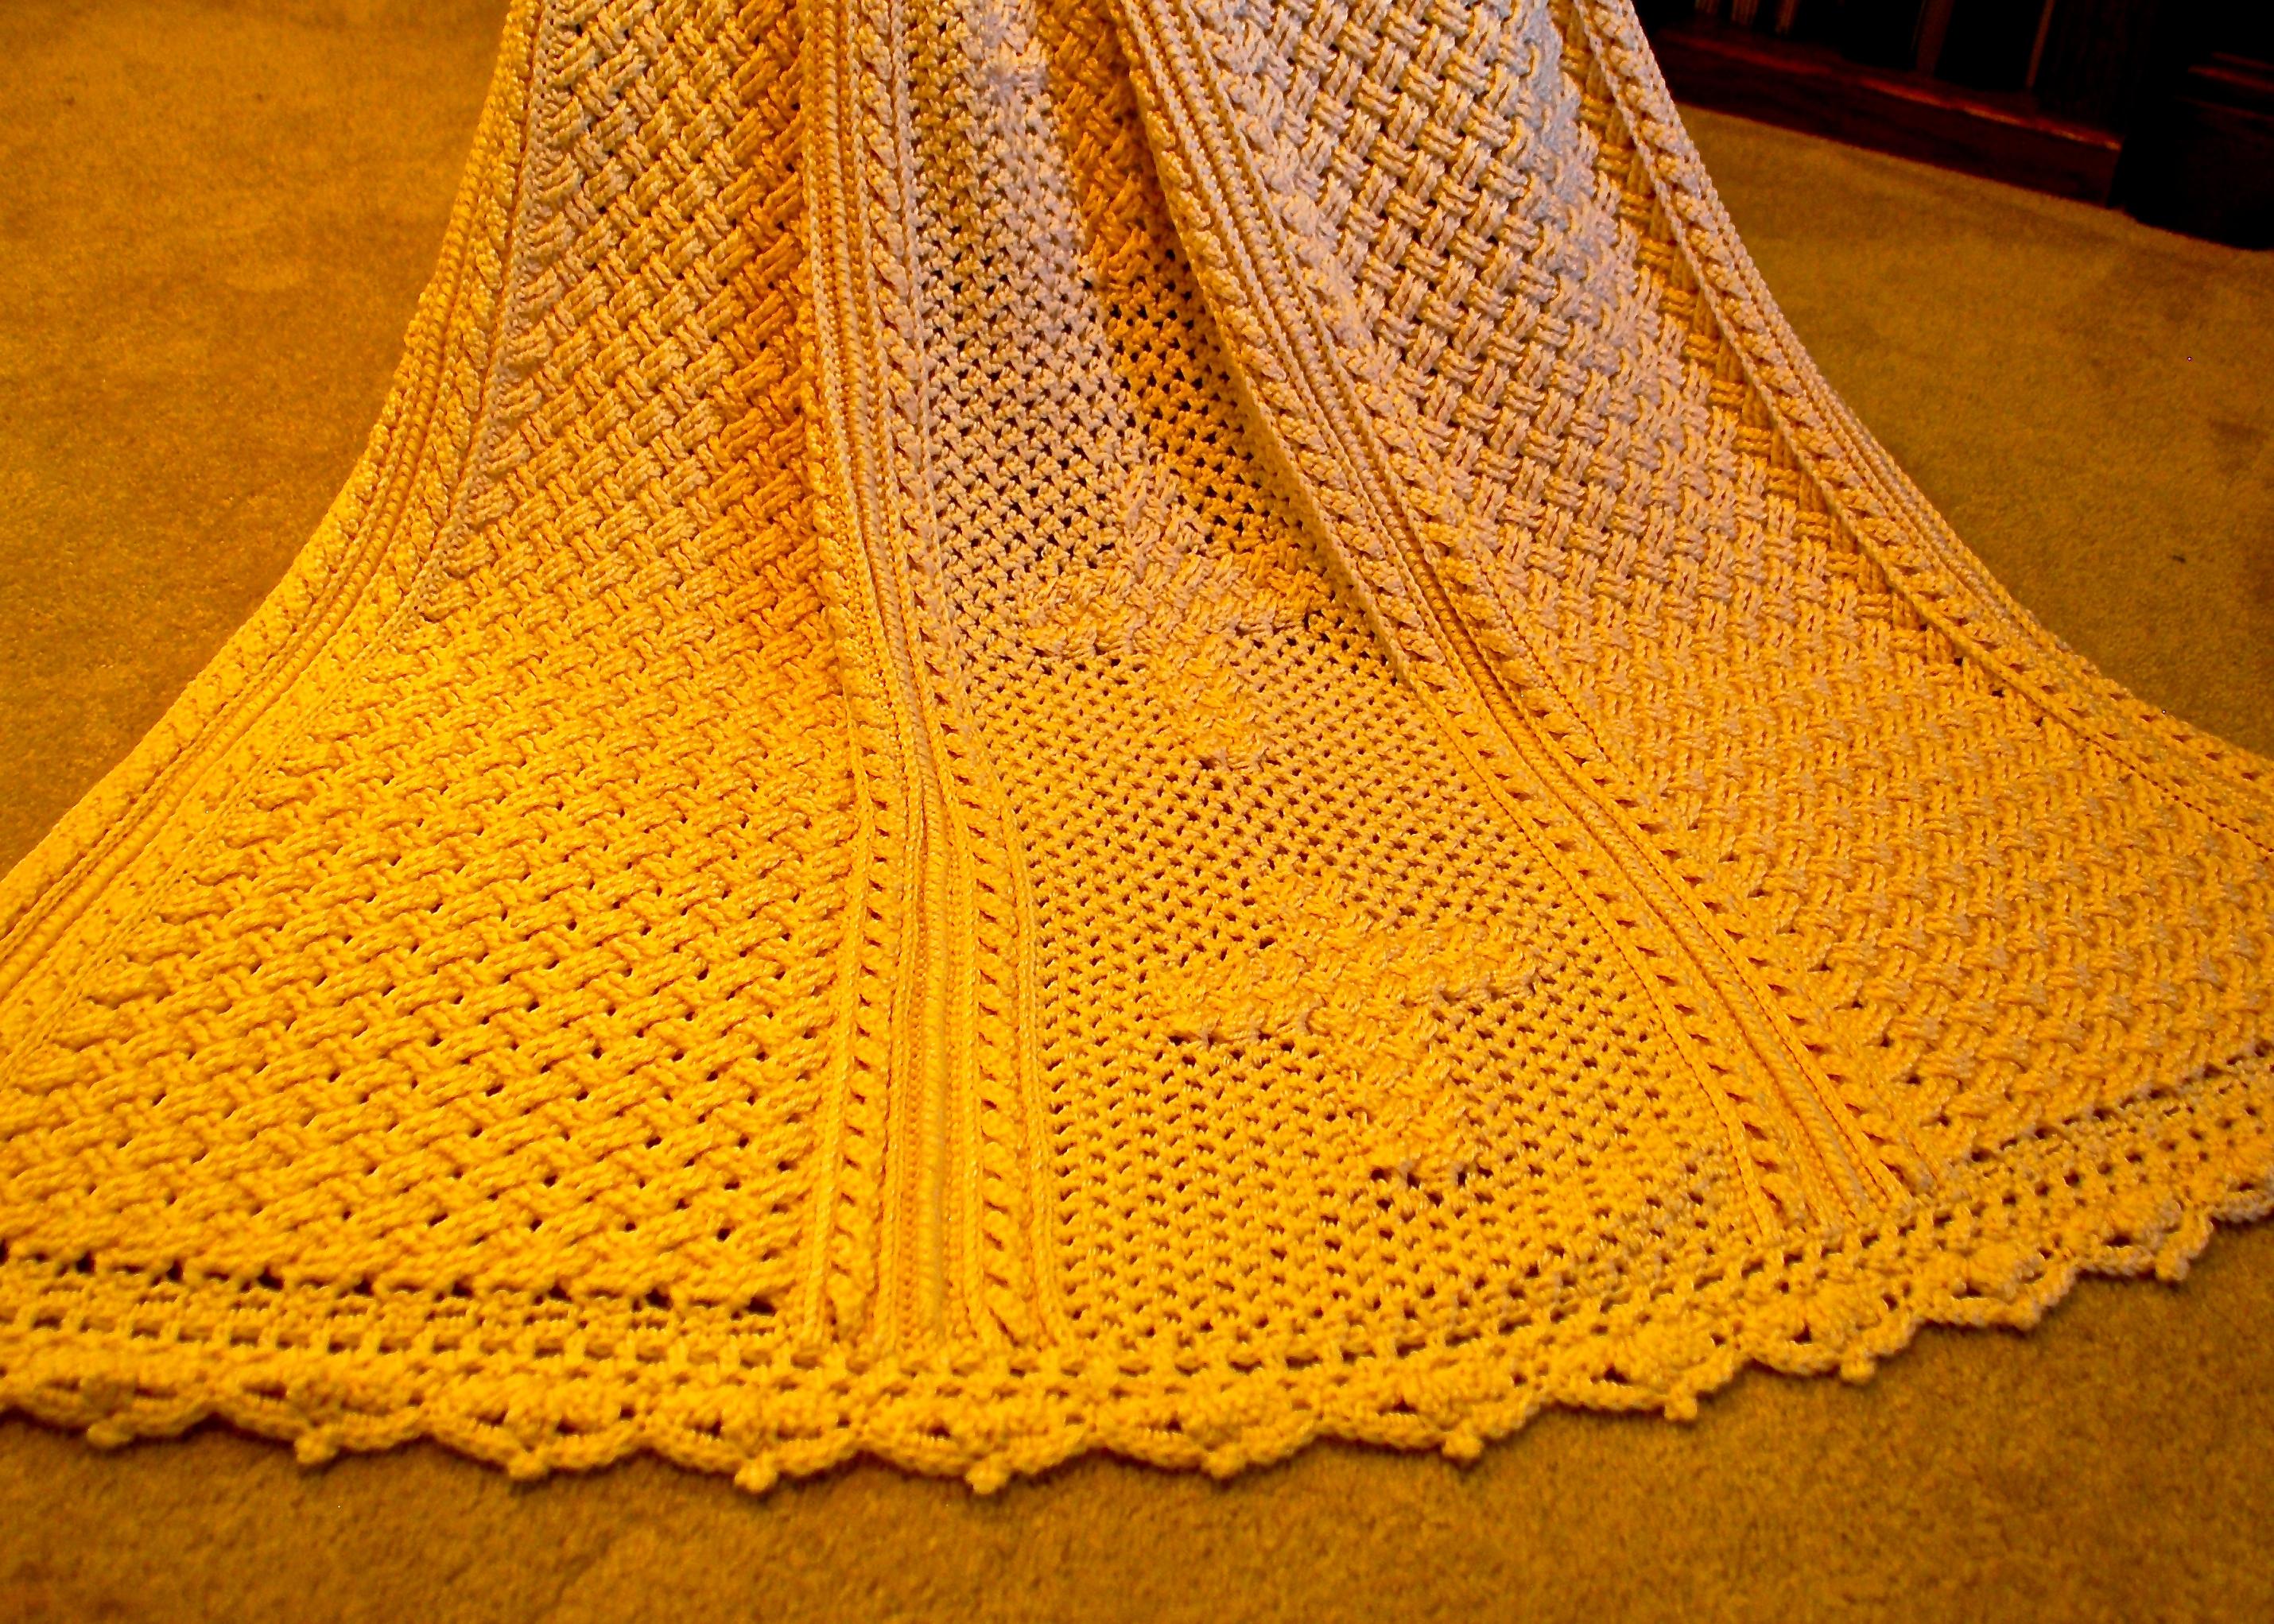 Bonnie Bay Crochet - Blog - The Celtic Cross Afghan and Pillow